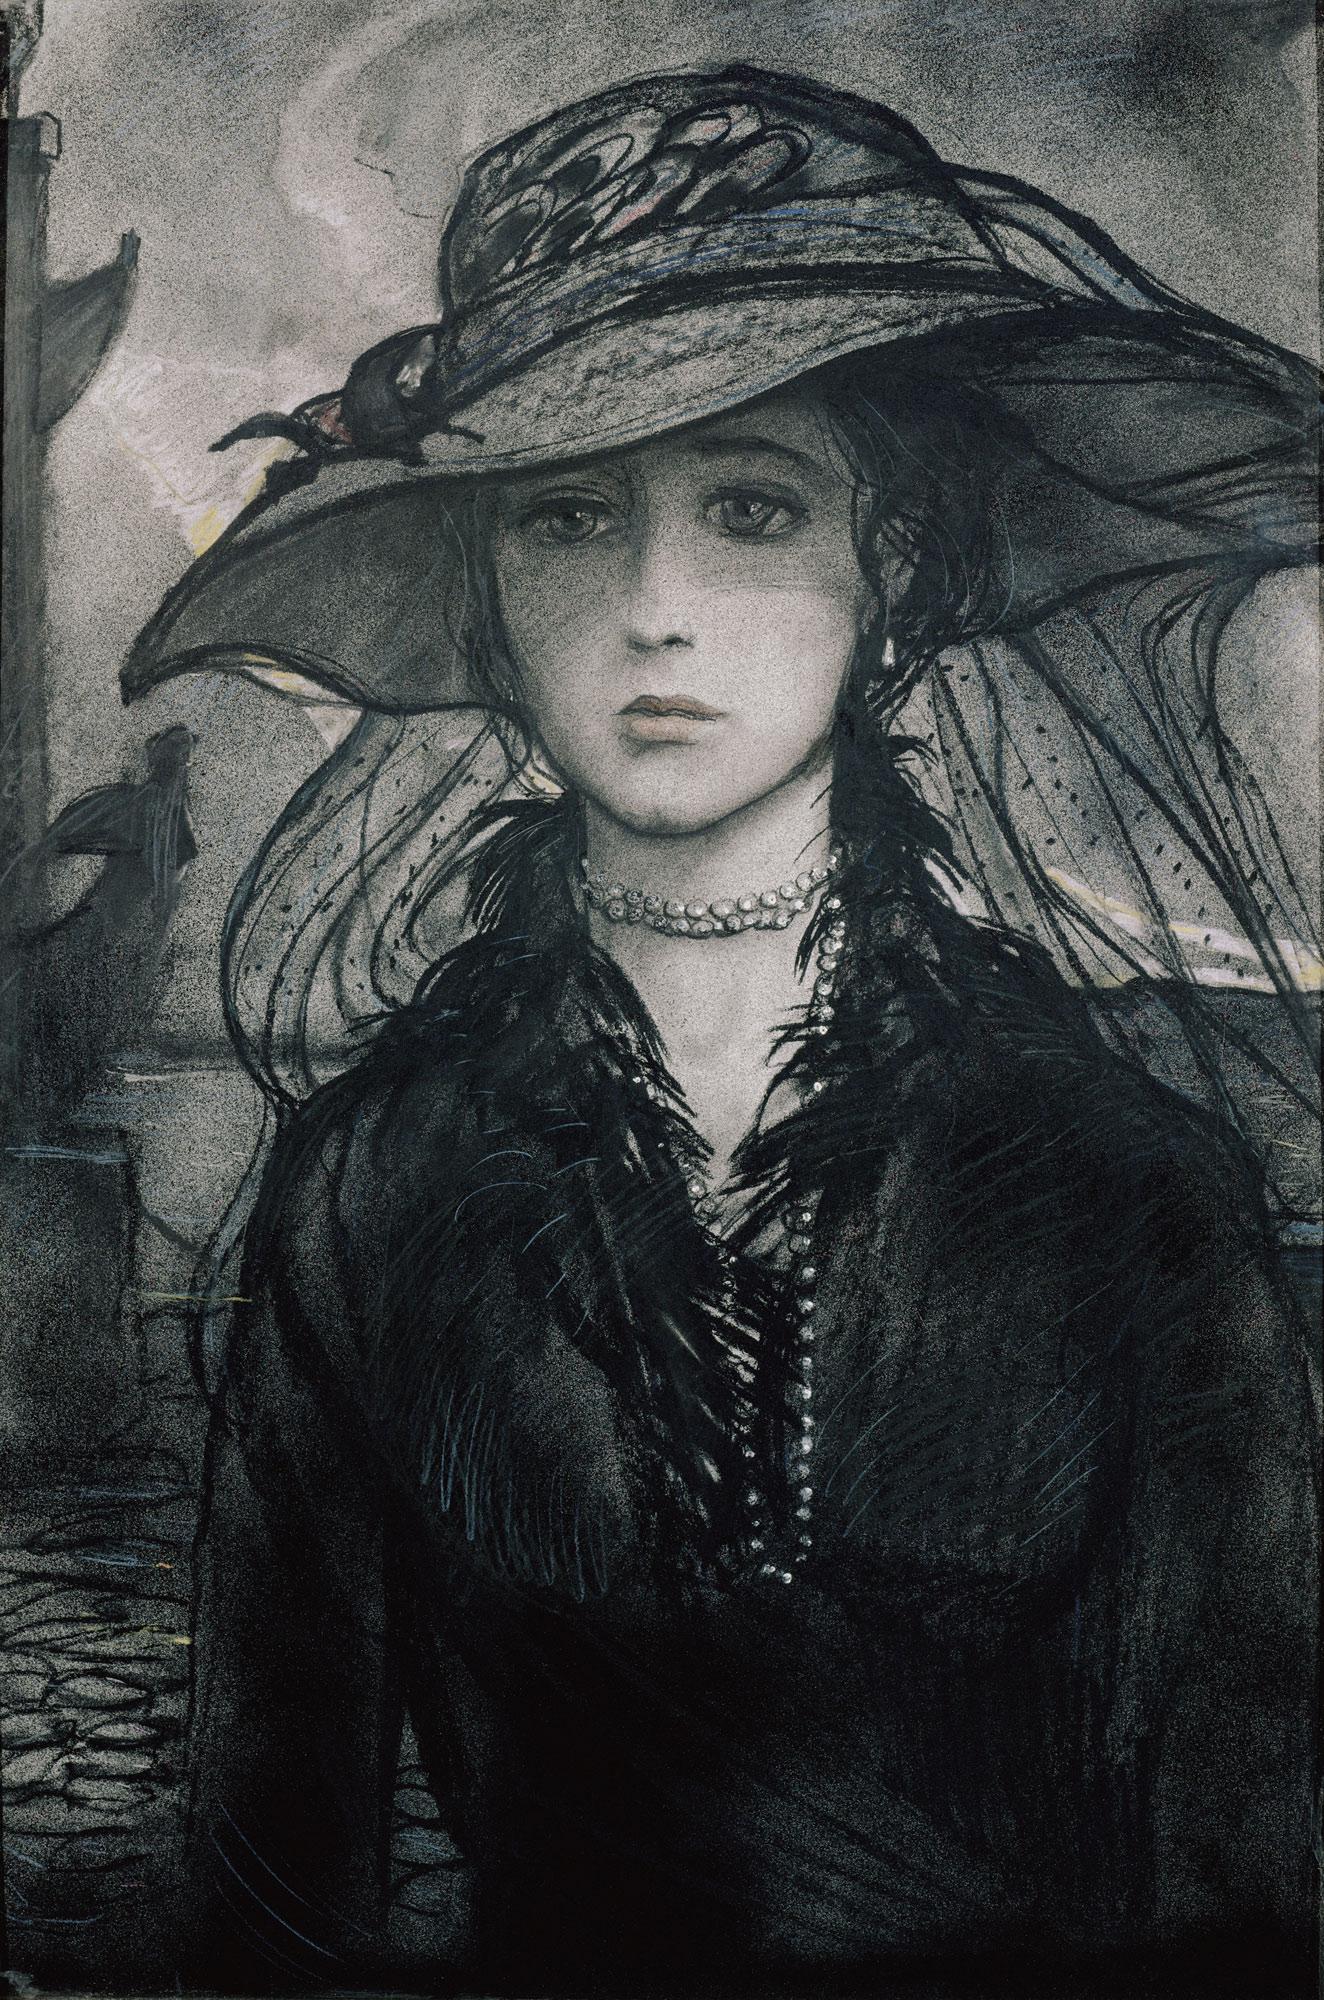 "Незнакомка. Иллюстрация к стихотворению А.А. Блока ""Незнакомка"", 1978"